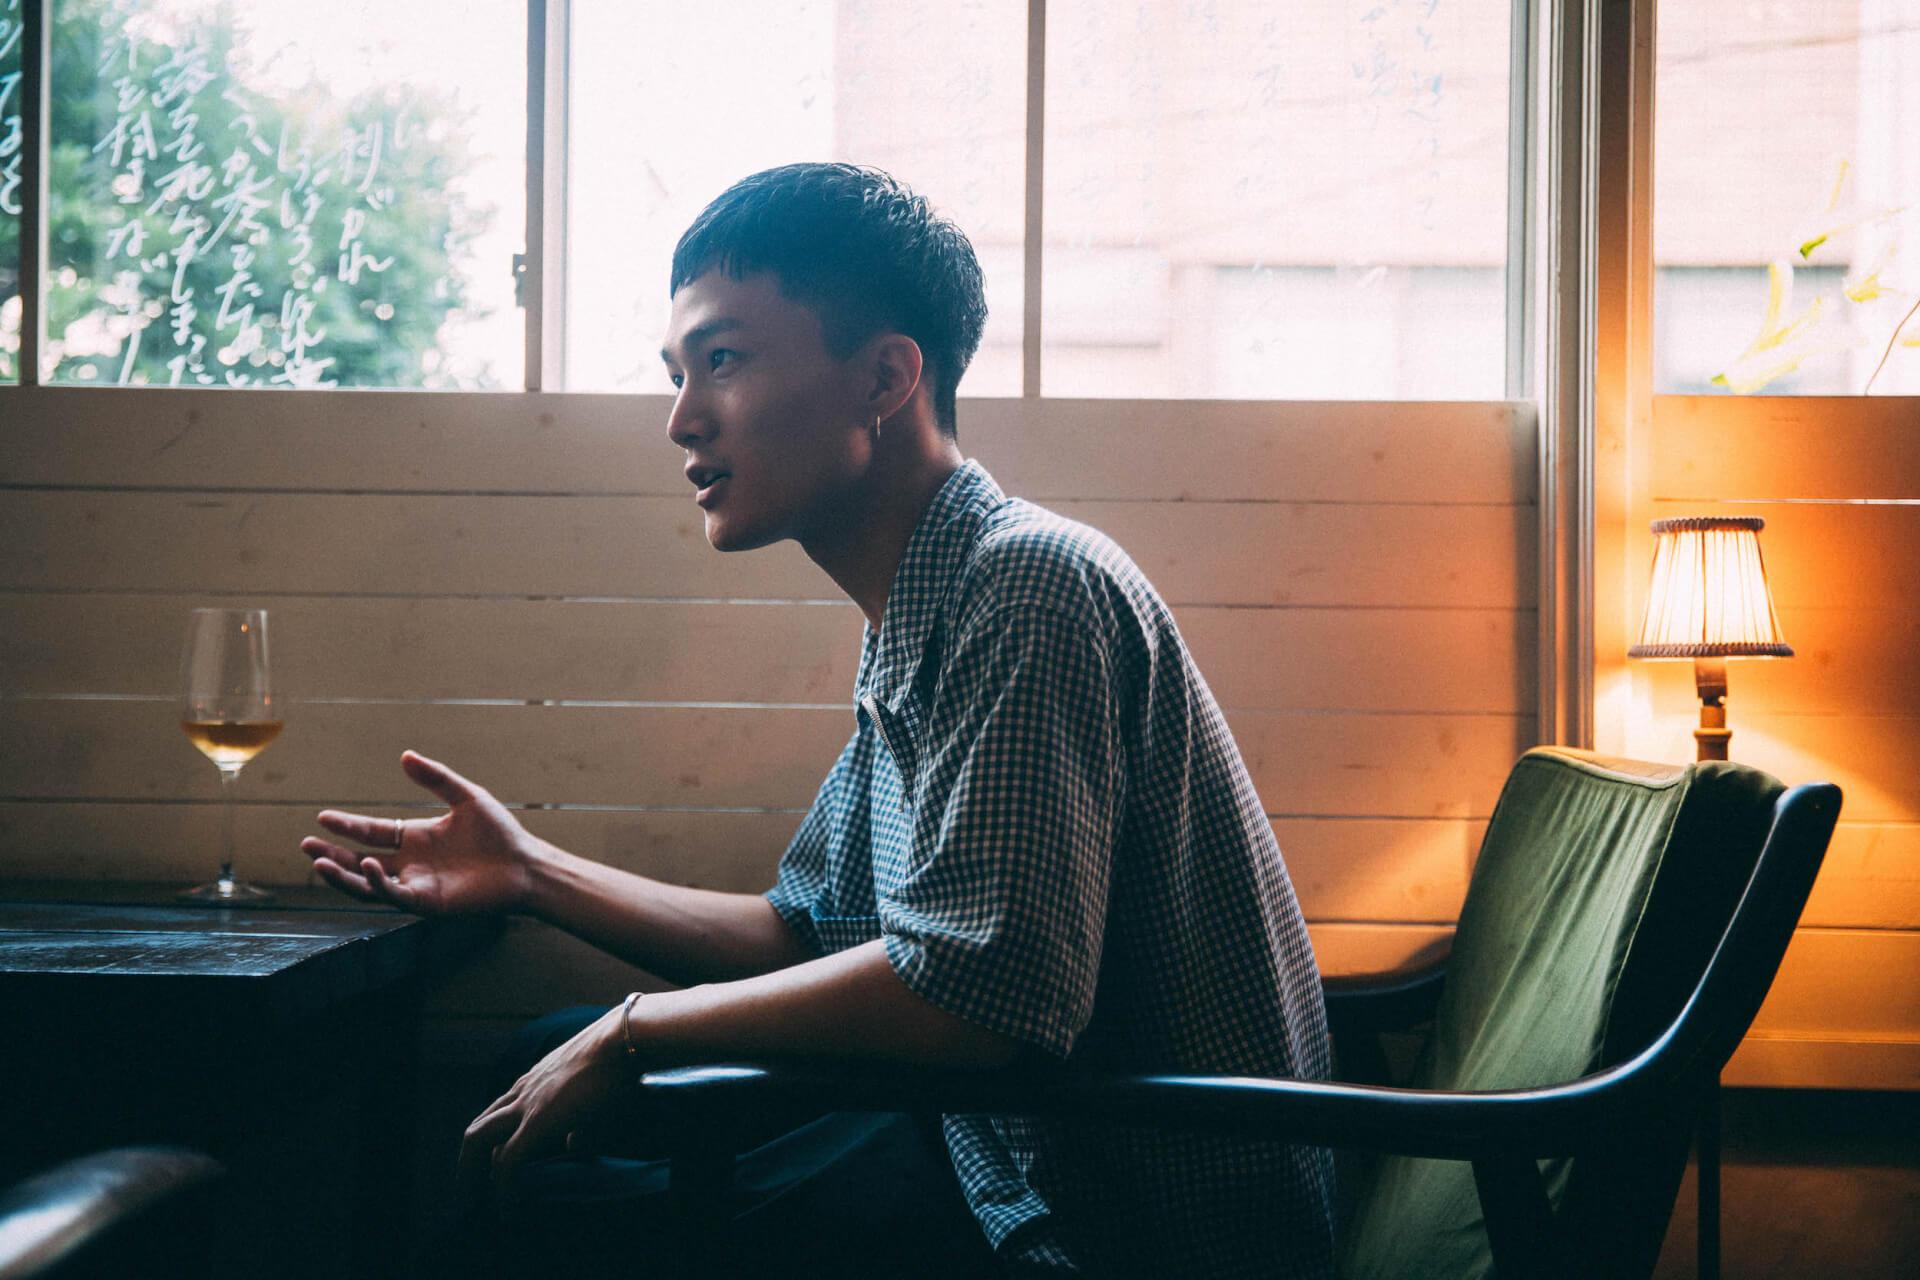 Shin Sakiuraが持つ無数の顔 — 初期衝動と現在地、ワンマンライブを語るインタビュー interview_190909_shinsakiura_694